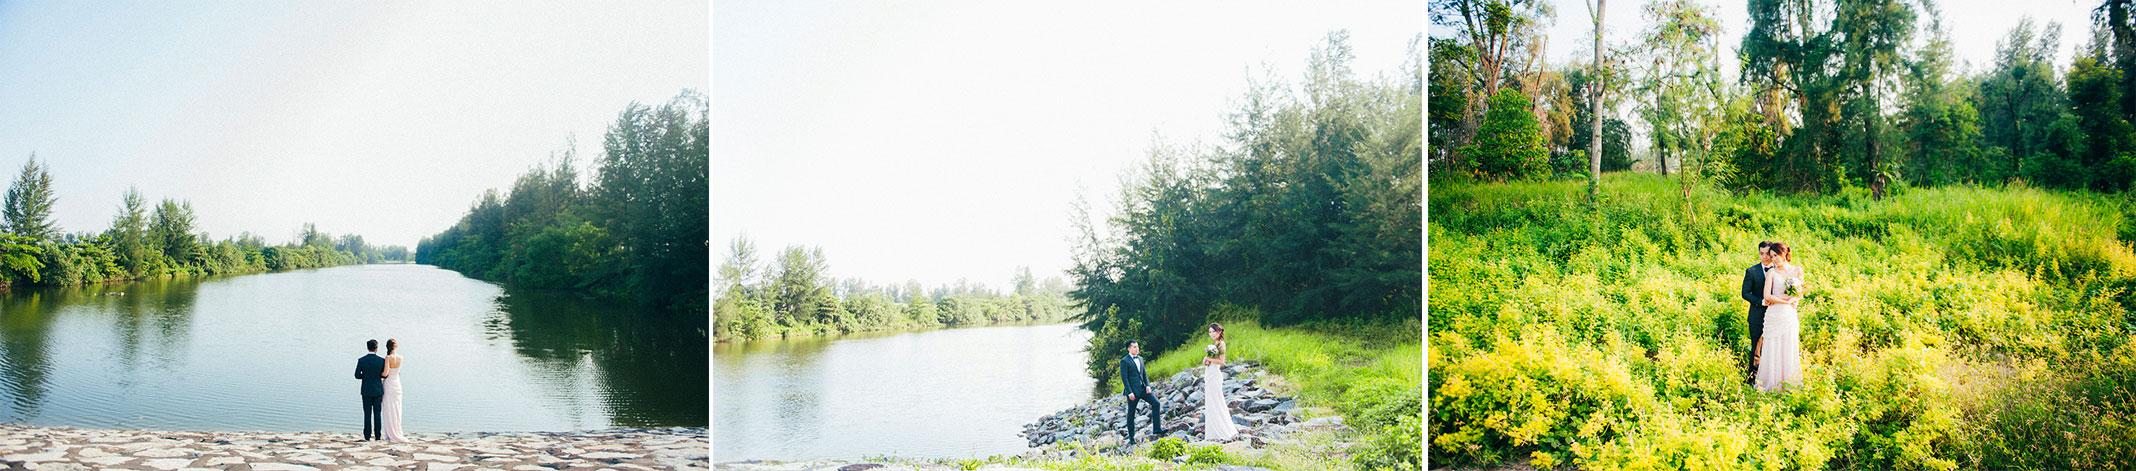 Seletar-North-Link-singapore-wedding